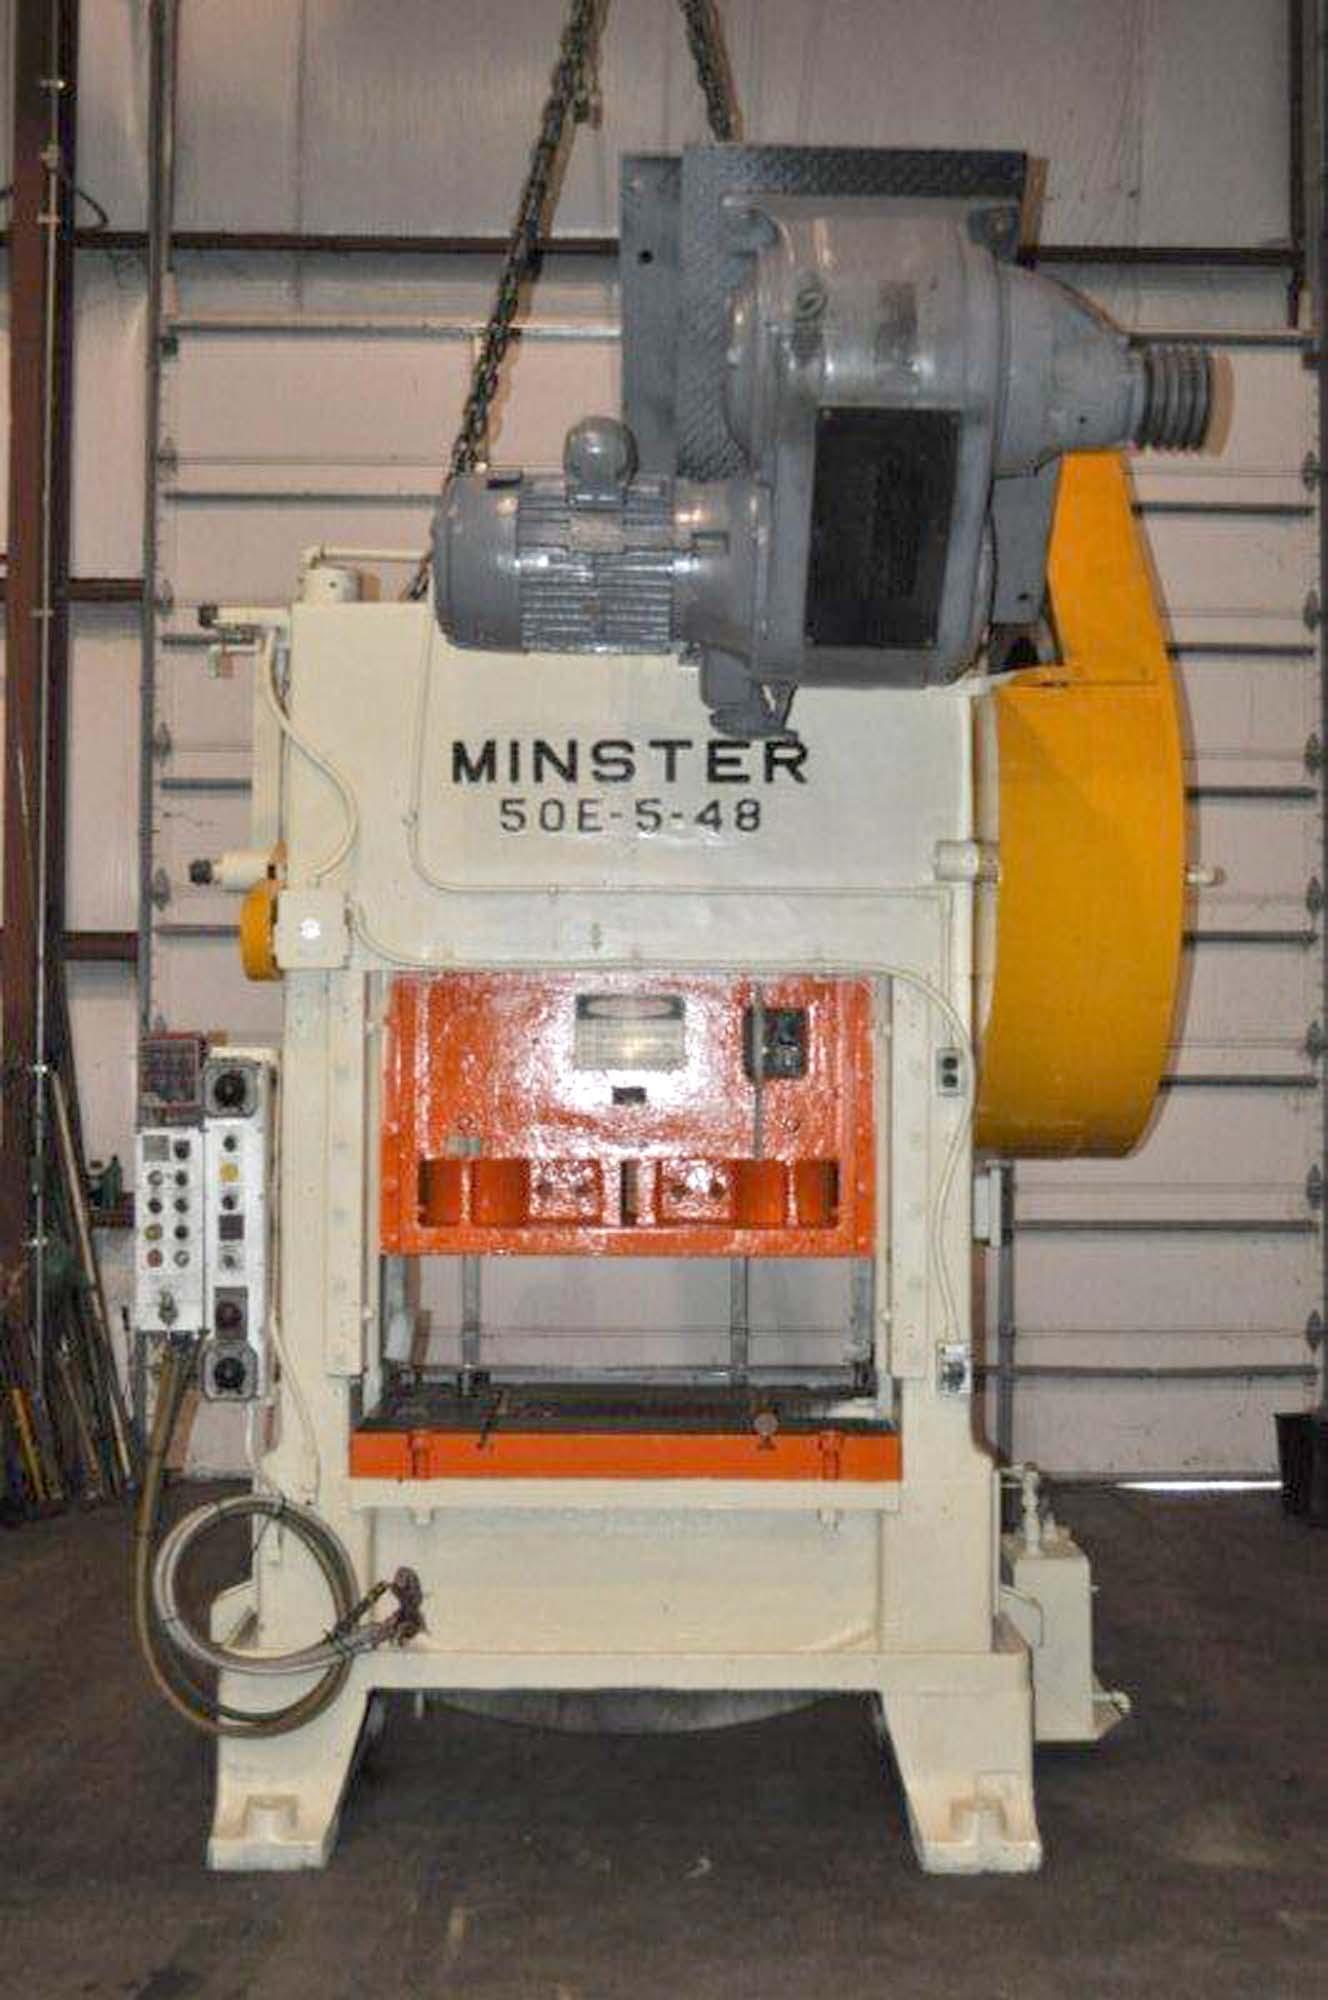 Minster # 50E-5-48, 93 Ton SSDC Press